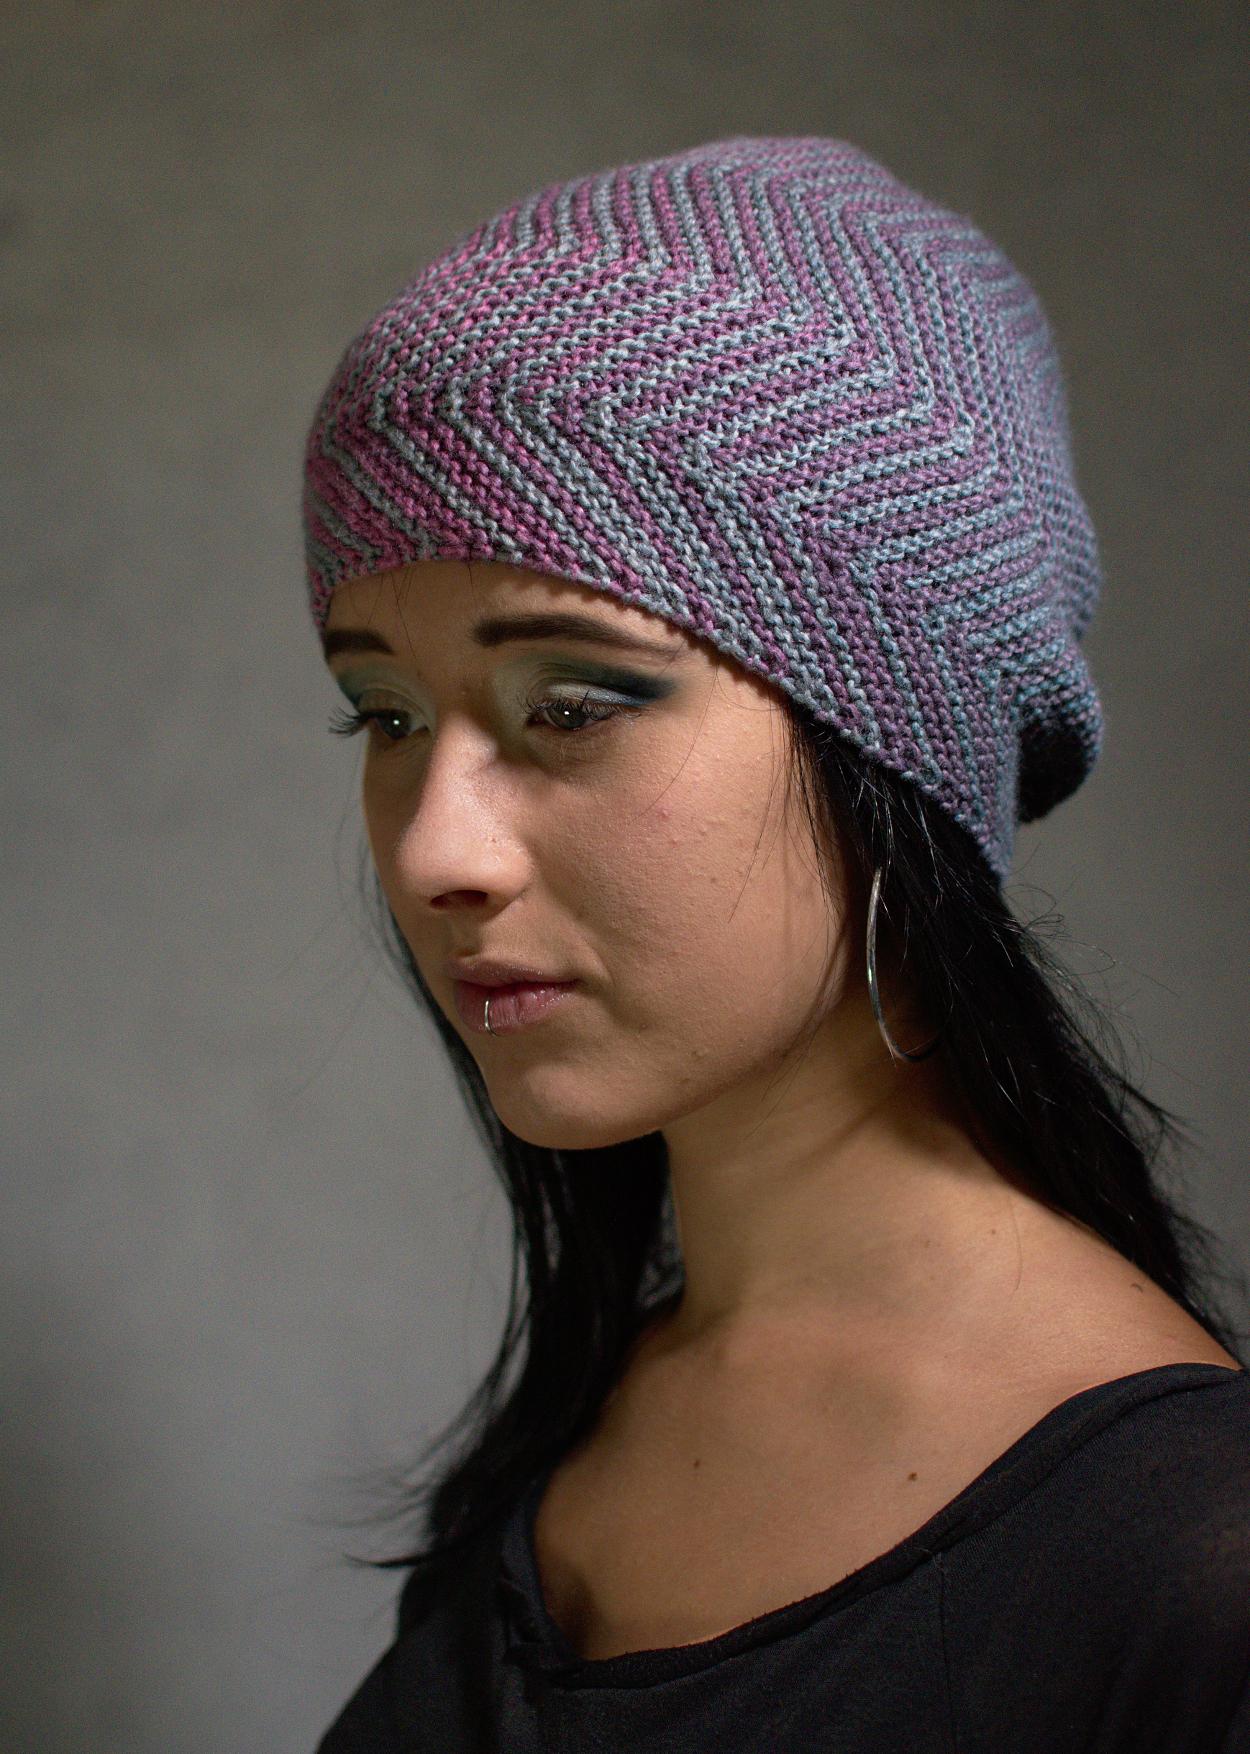 Juxta sideways knit Hat knitting pattern for gradient yarns